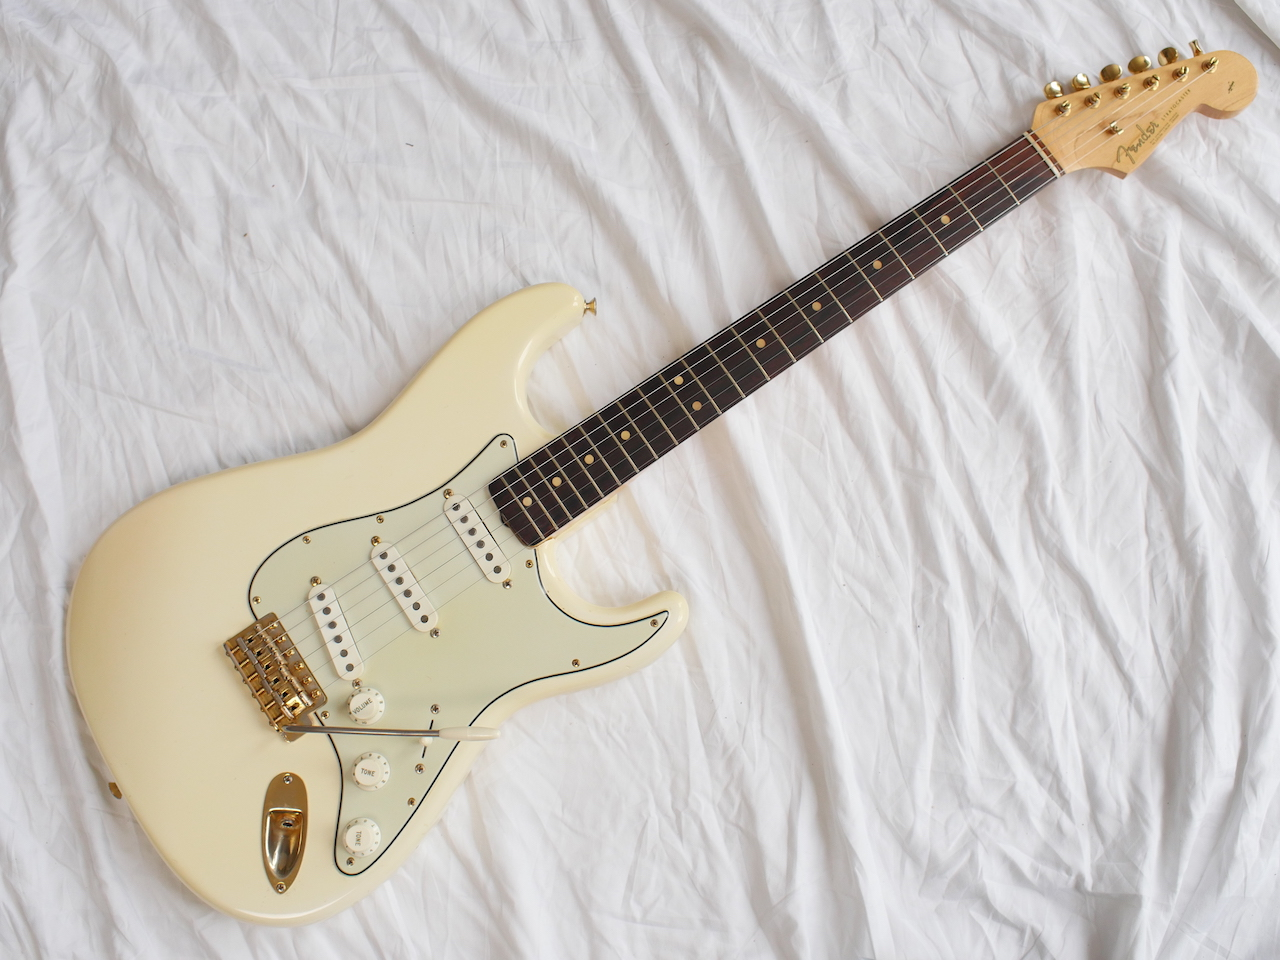 Fender Stratocaster 1963 Olympic White GOLD Hardware Guitar For Sale ...